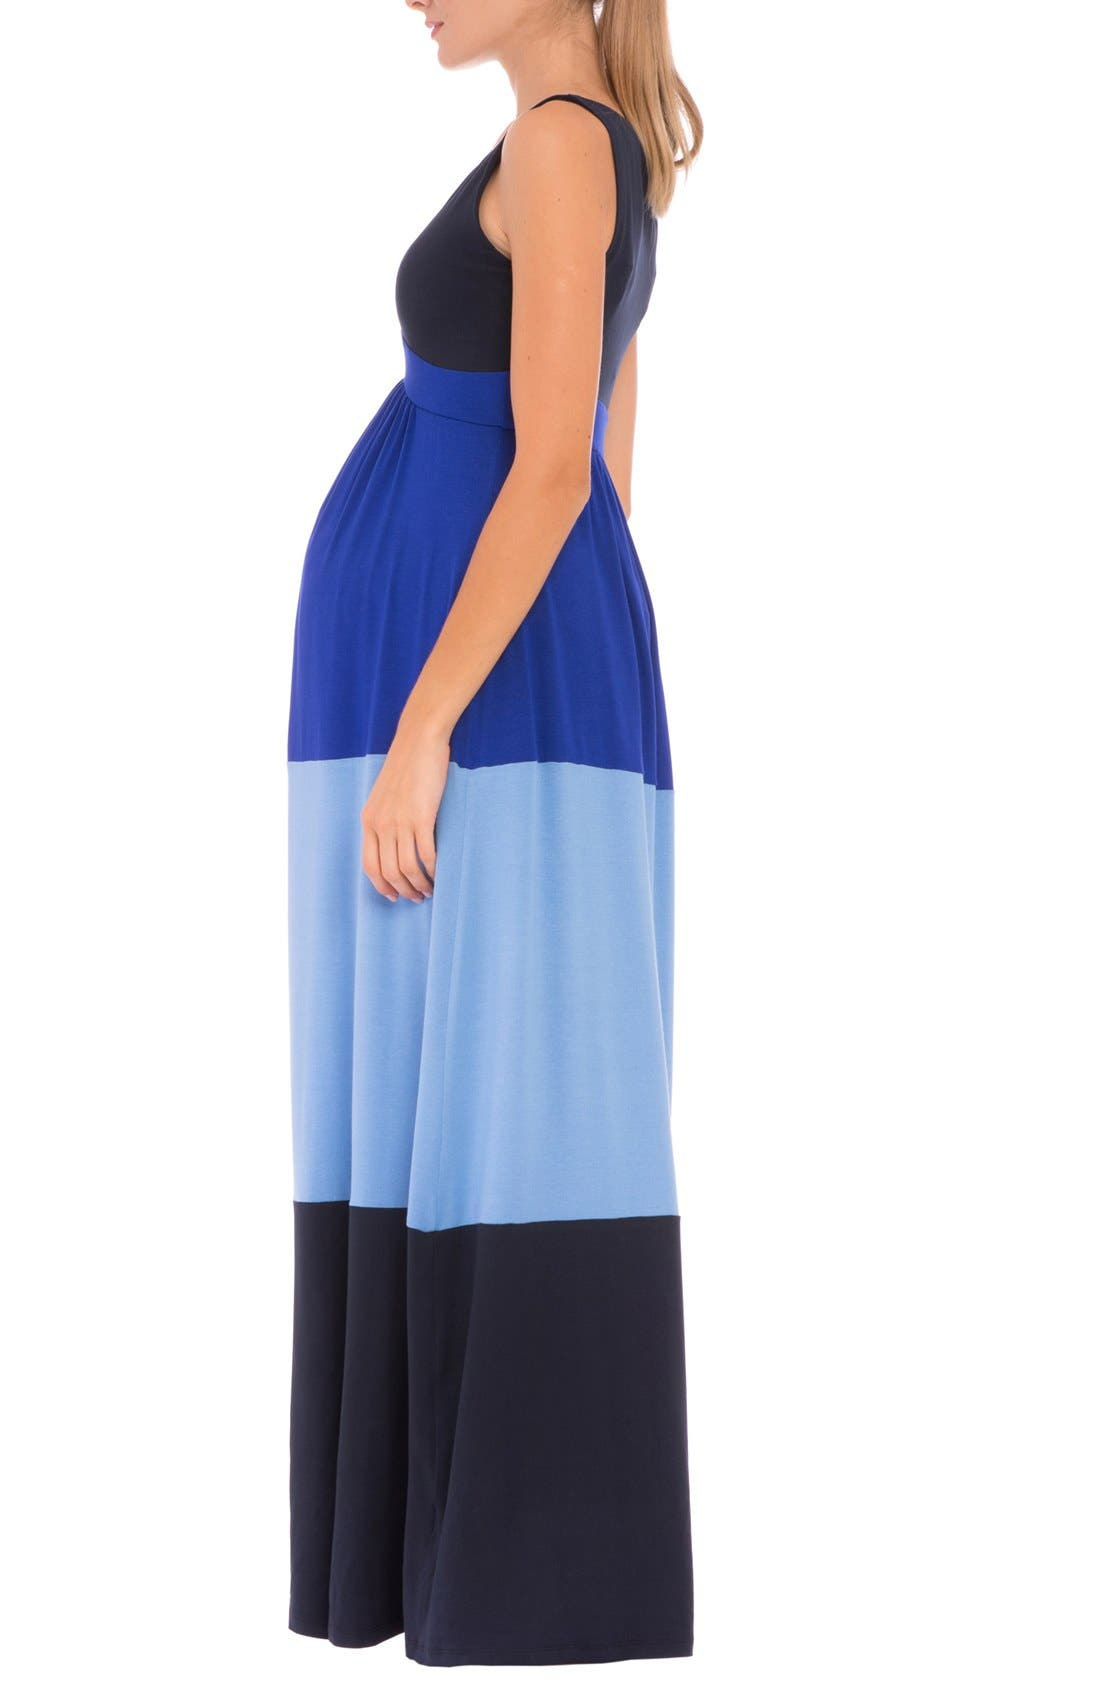 Alternate Image 3  - Olian 'Margarette' Colorblock Maternity Tank Dress